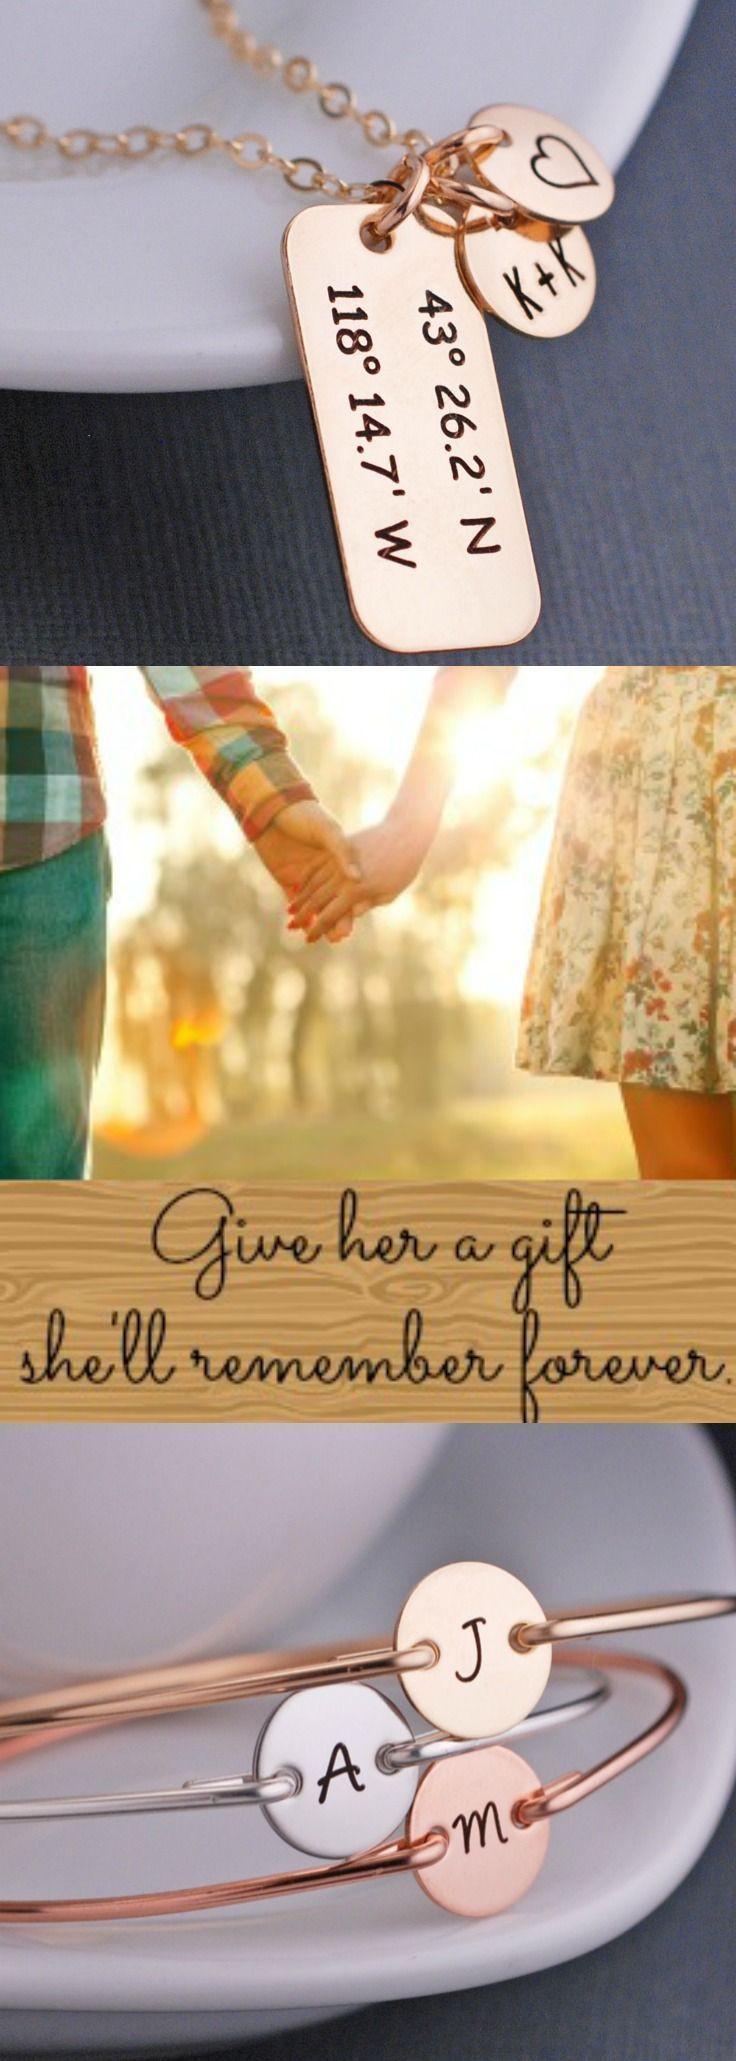 Anniversary Gift Ideas For Girlfriend  Best 25 Girlfriend anniversary ts ideas on Pinterest